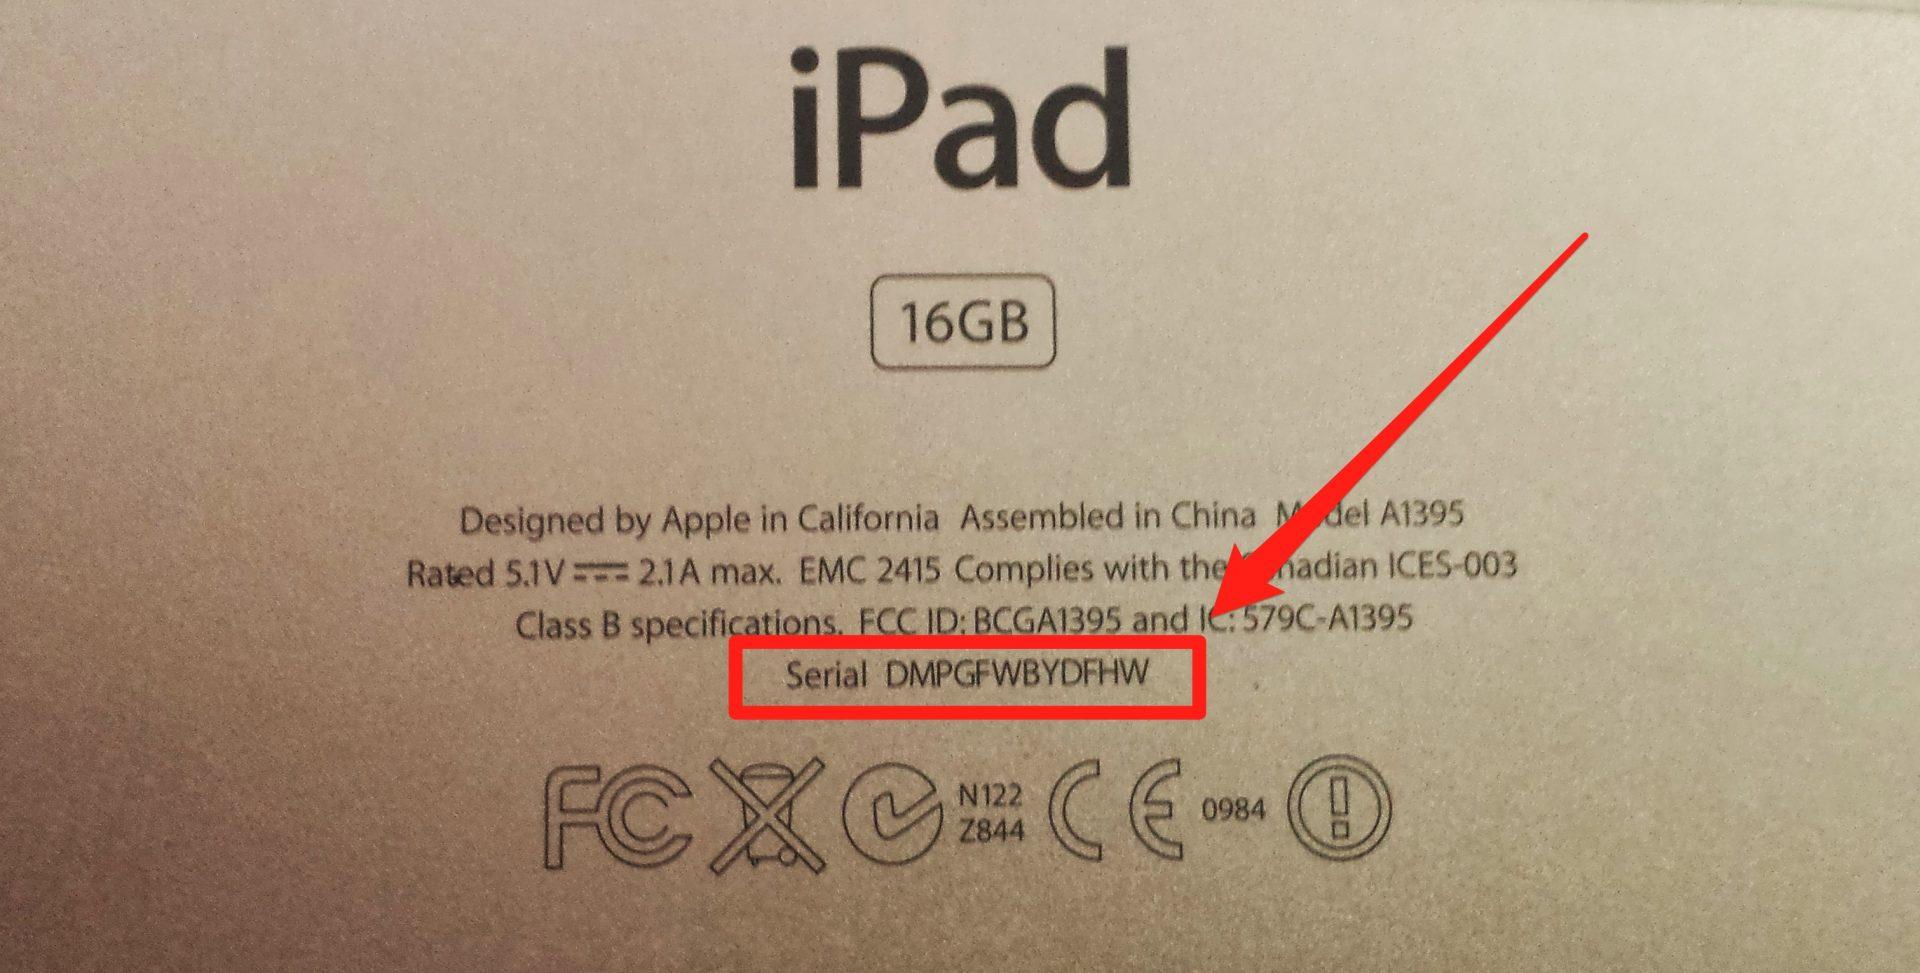 Check Ipad icloud status with Serial